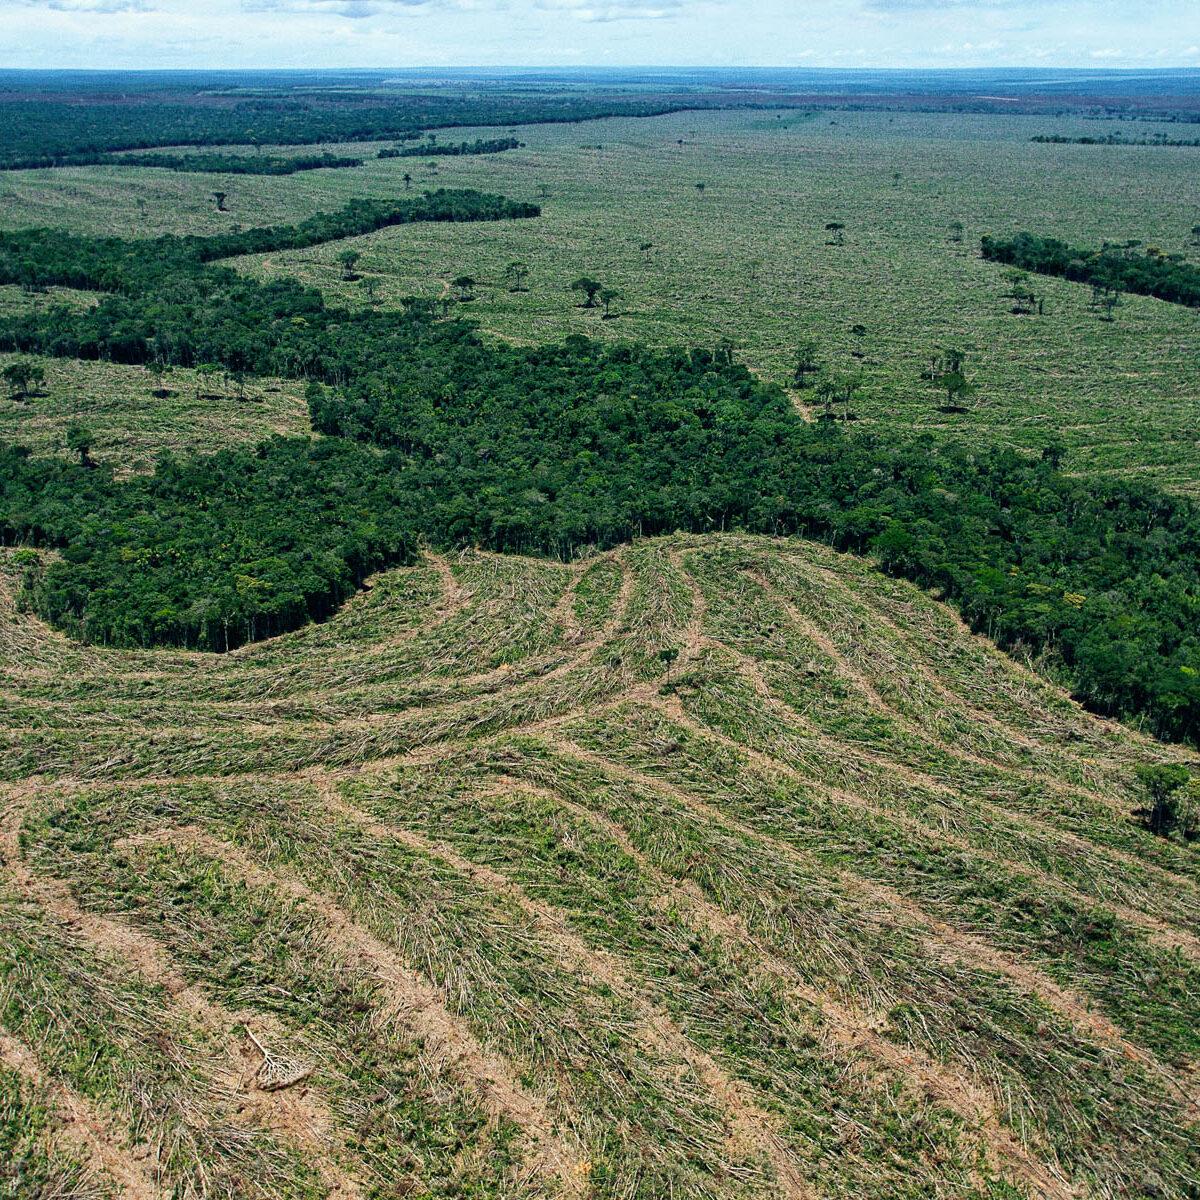 déforestation zéro émission nette